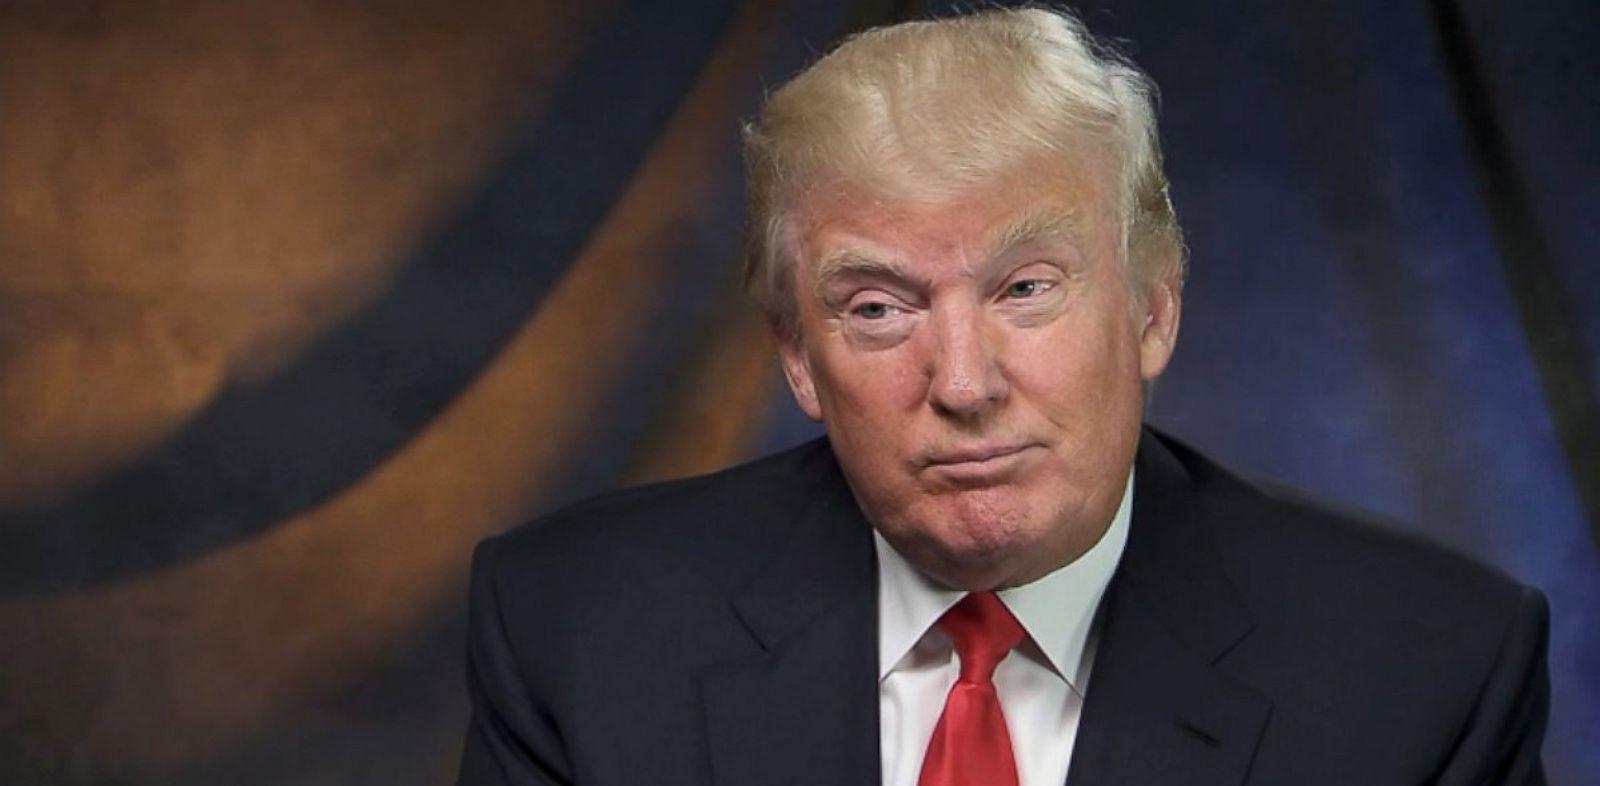 Satan Regrets Deal Made with Donald Trump